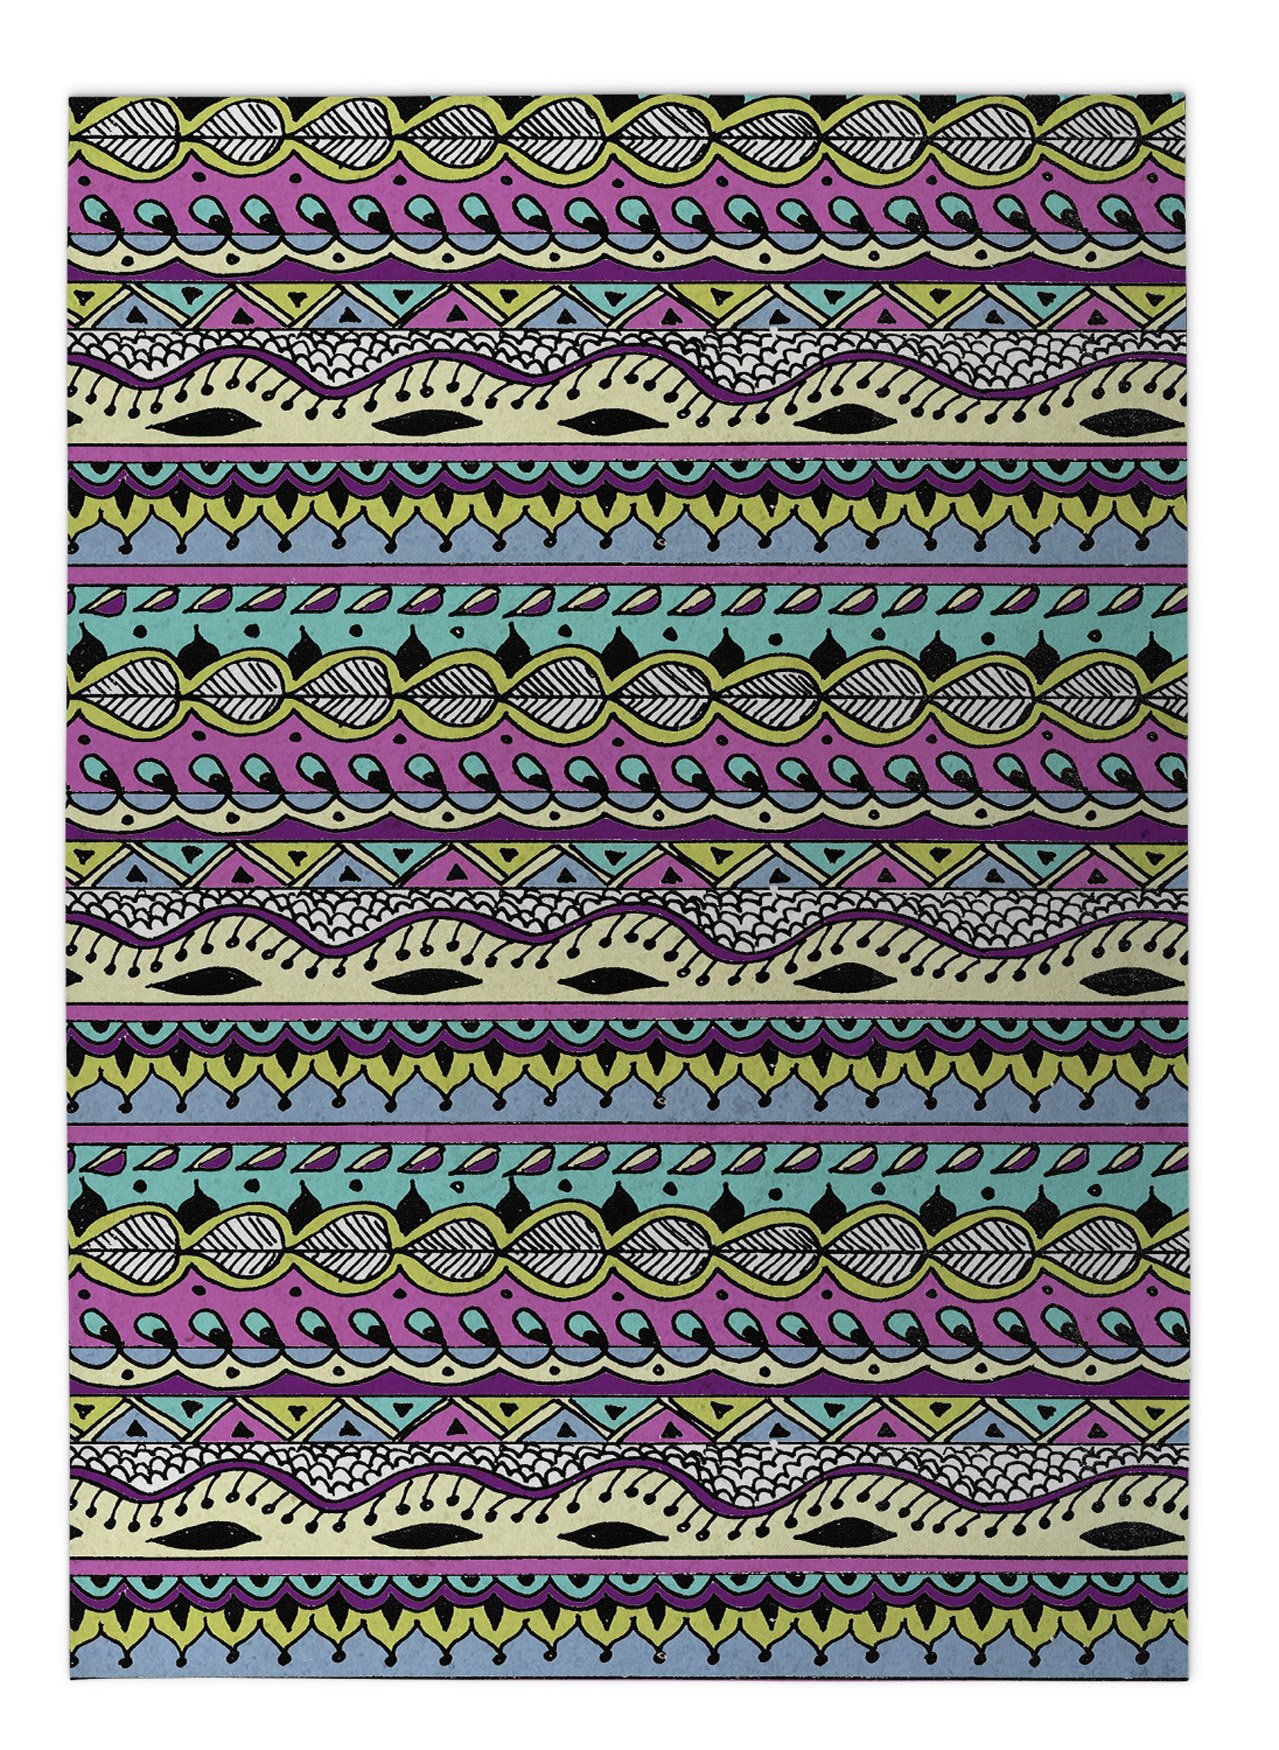 KAVKA DESIGNS Color Dance Indoor-Outdoor Floor Mat, (Blue/Pink/Purple/Yellow), Size: 24x36x0.2 - (PLUAVC110FM23)